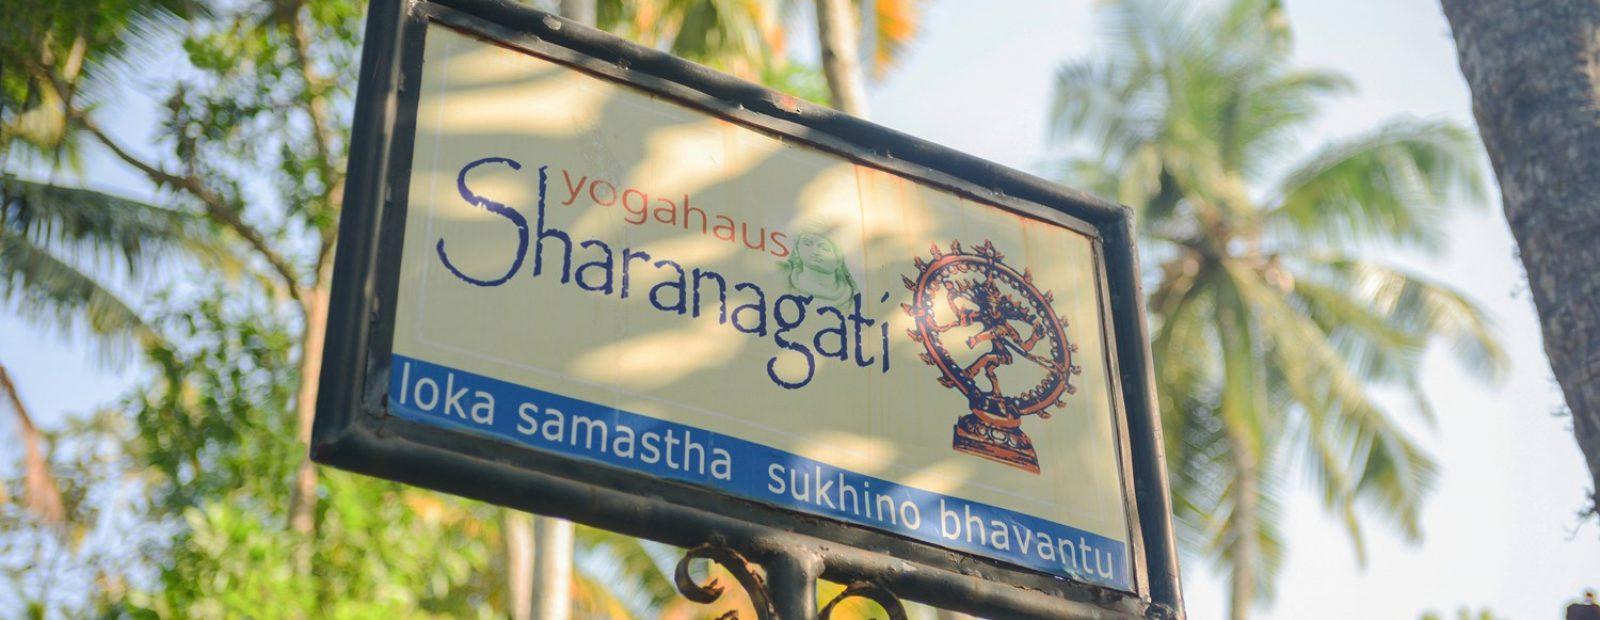 Out side sign of Sharanagati Yogahaus, Thiruvambadi Road, Varkala